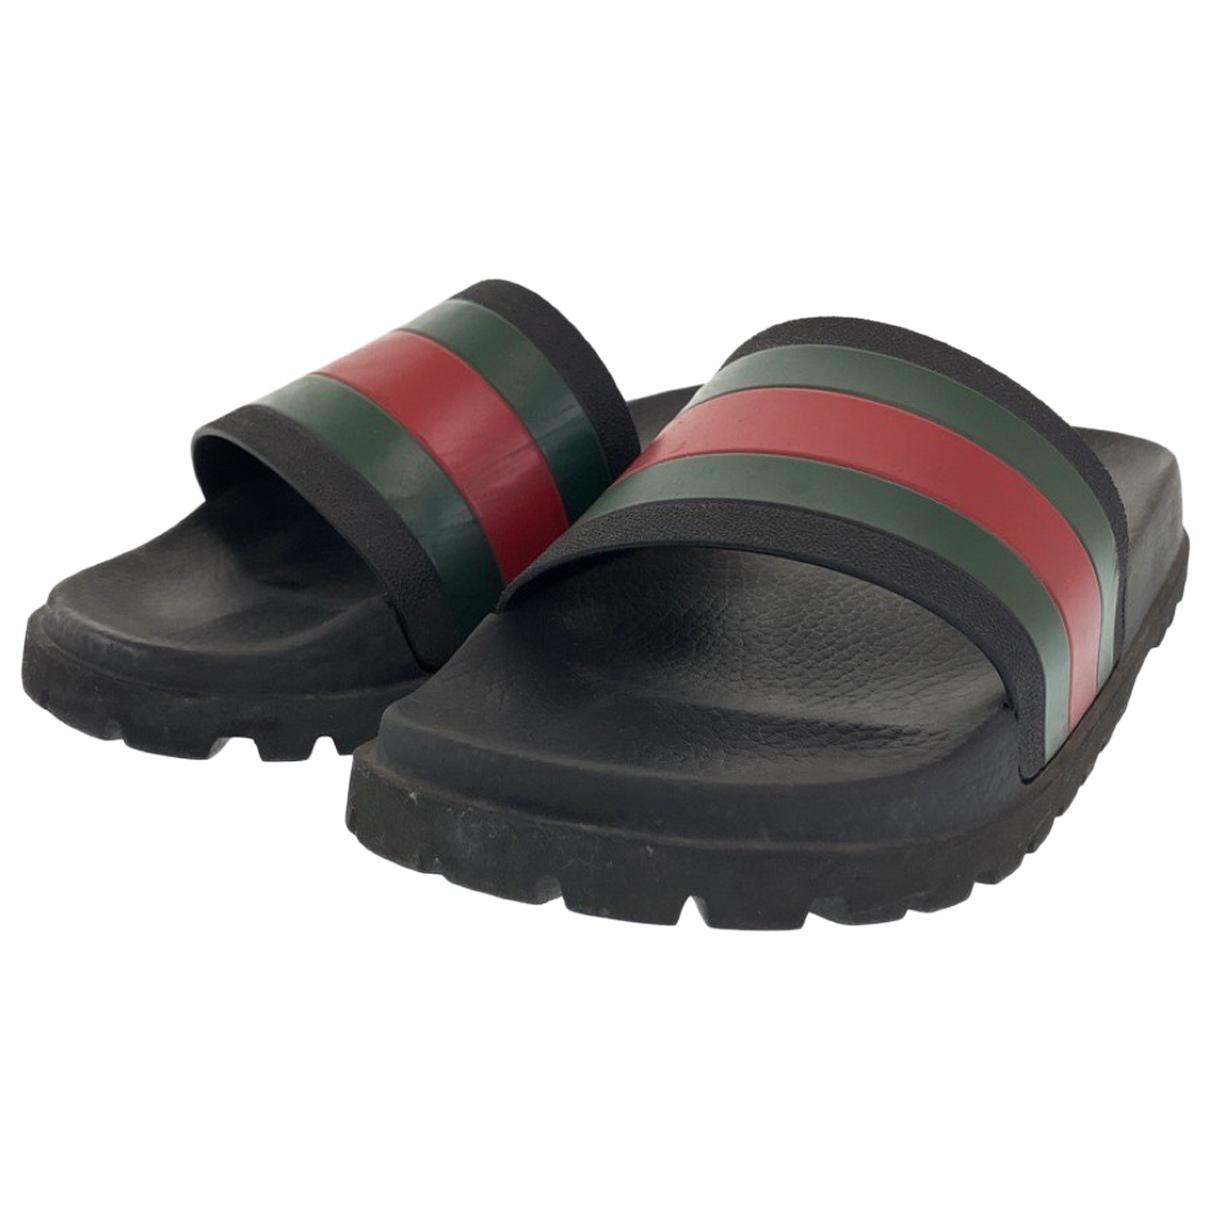 Gucci N Rubber Sandals for Men 10 US